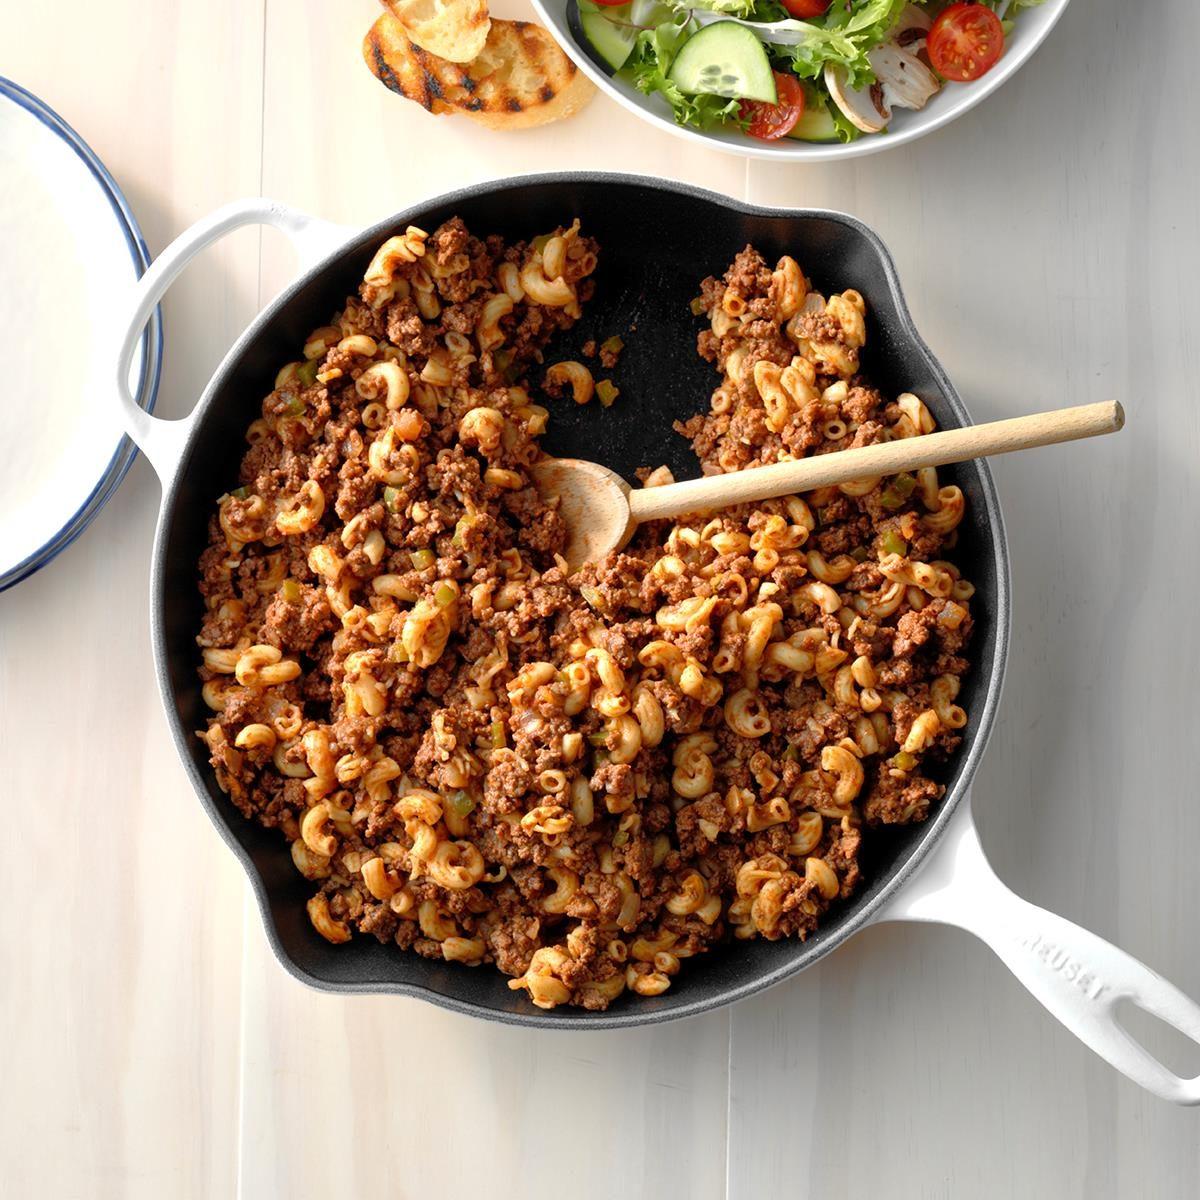 Skillet Beef and Macaroni